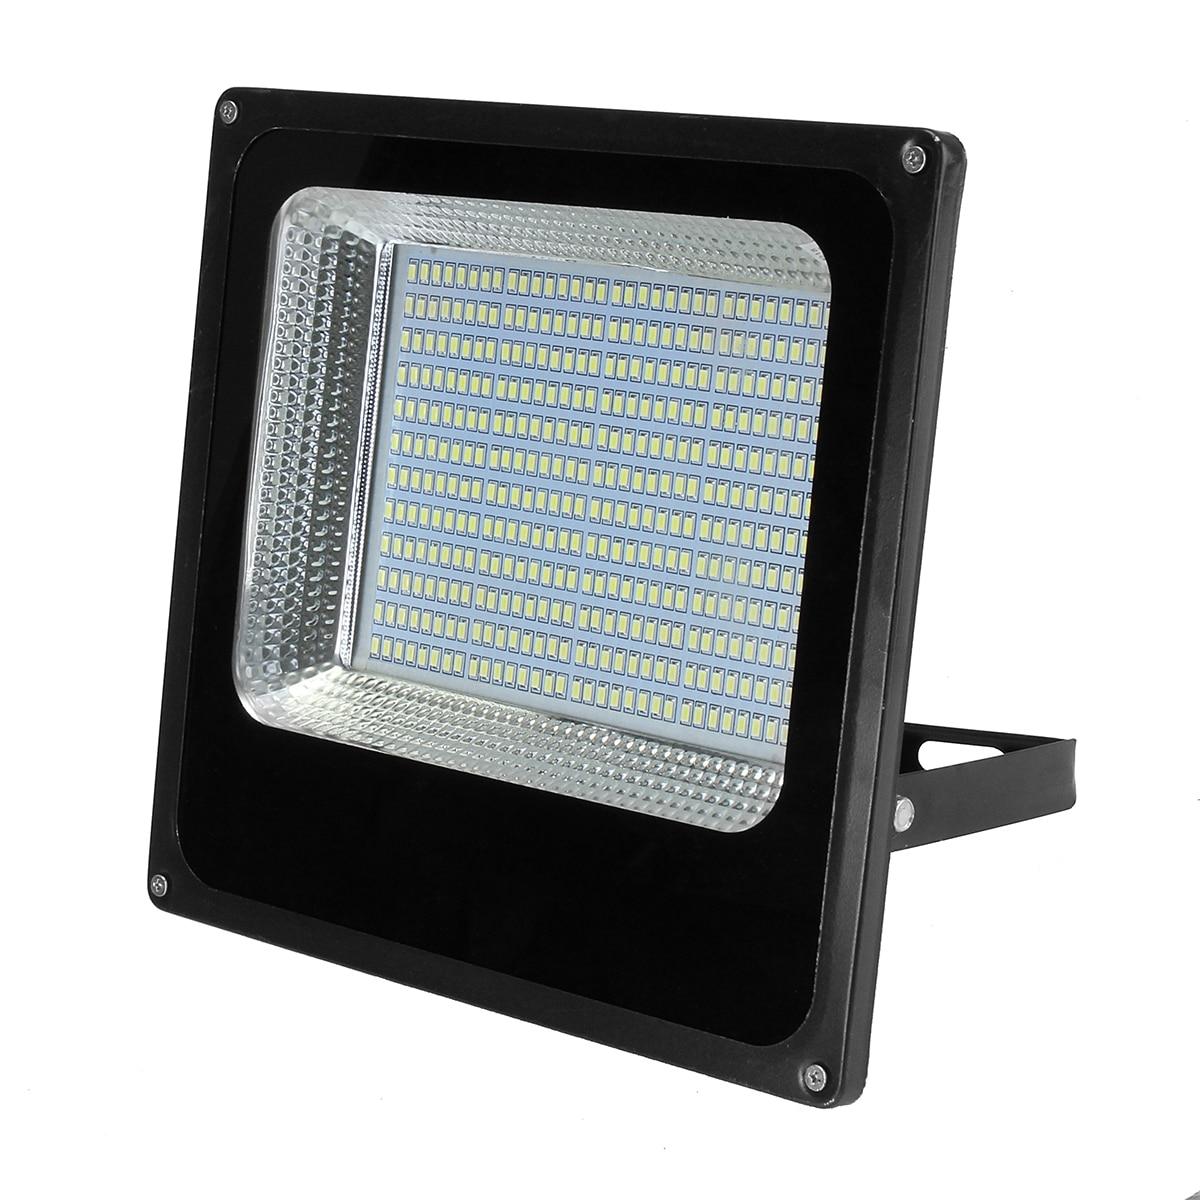 220V 60W LED Floodlight Outdoor Lighting 2835SMD 384LED Wall Washer Lamp Super Bright Security Lights Waterproof Led Flood Light